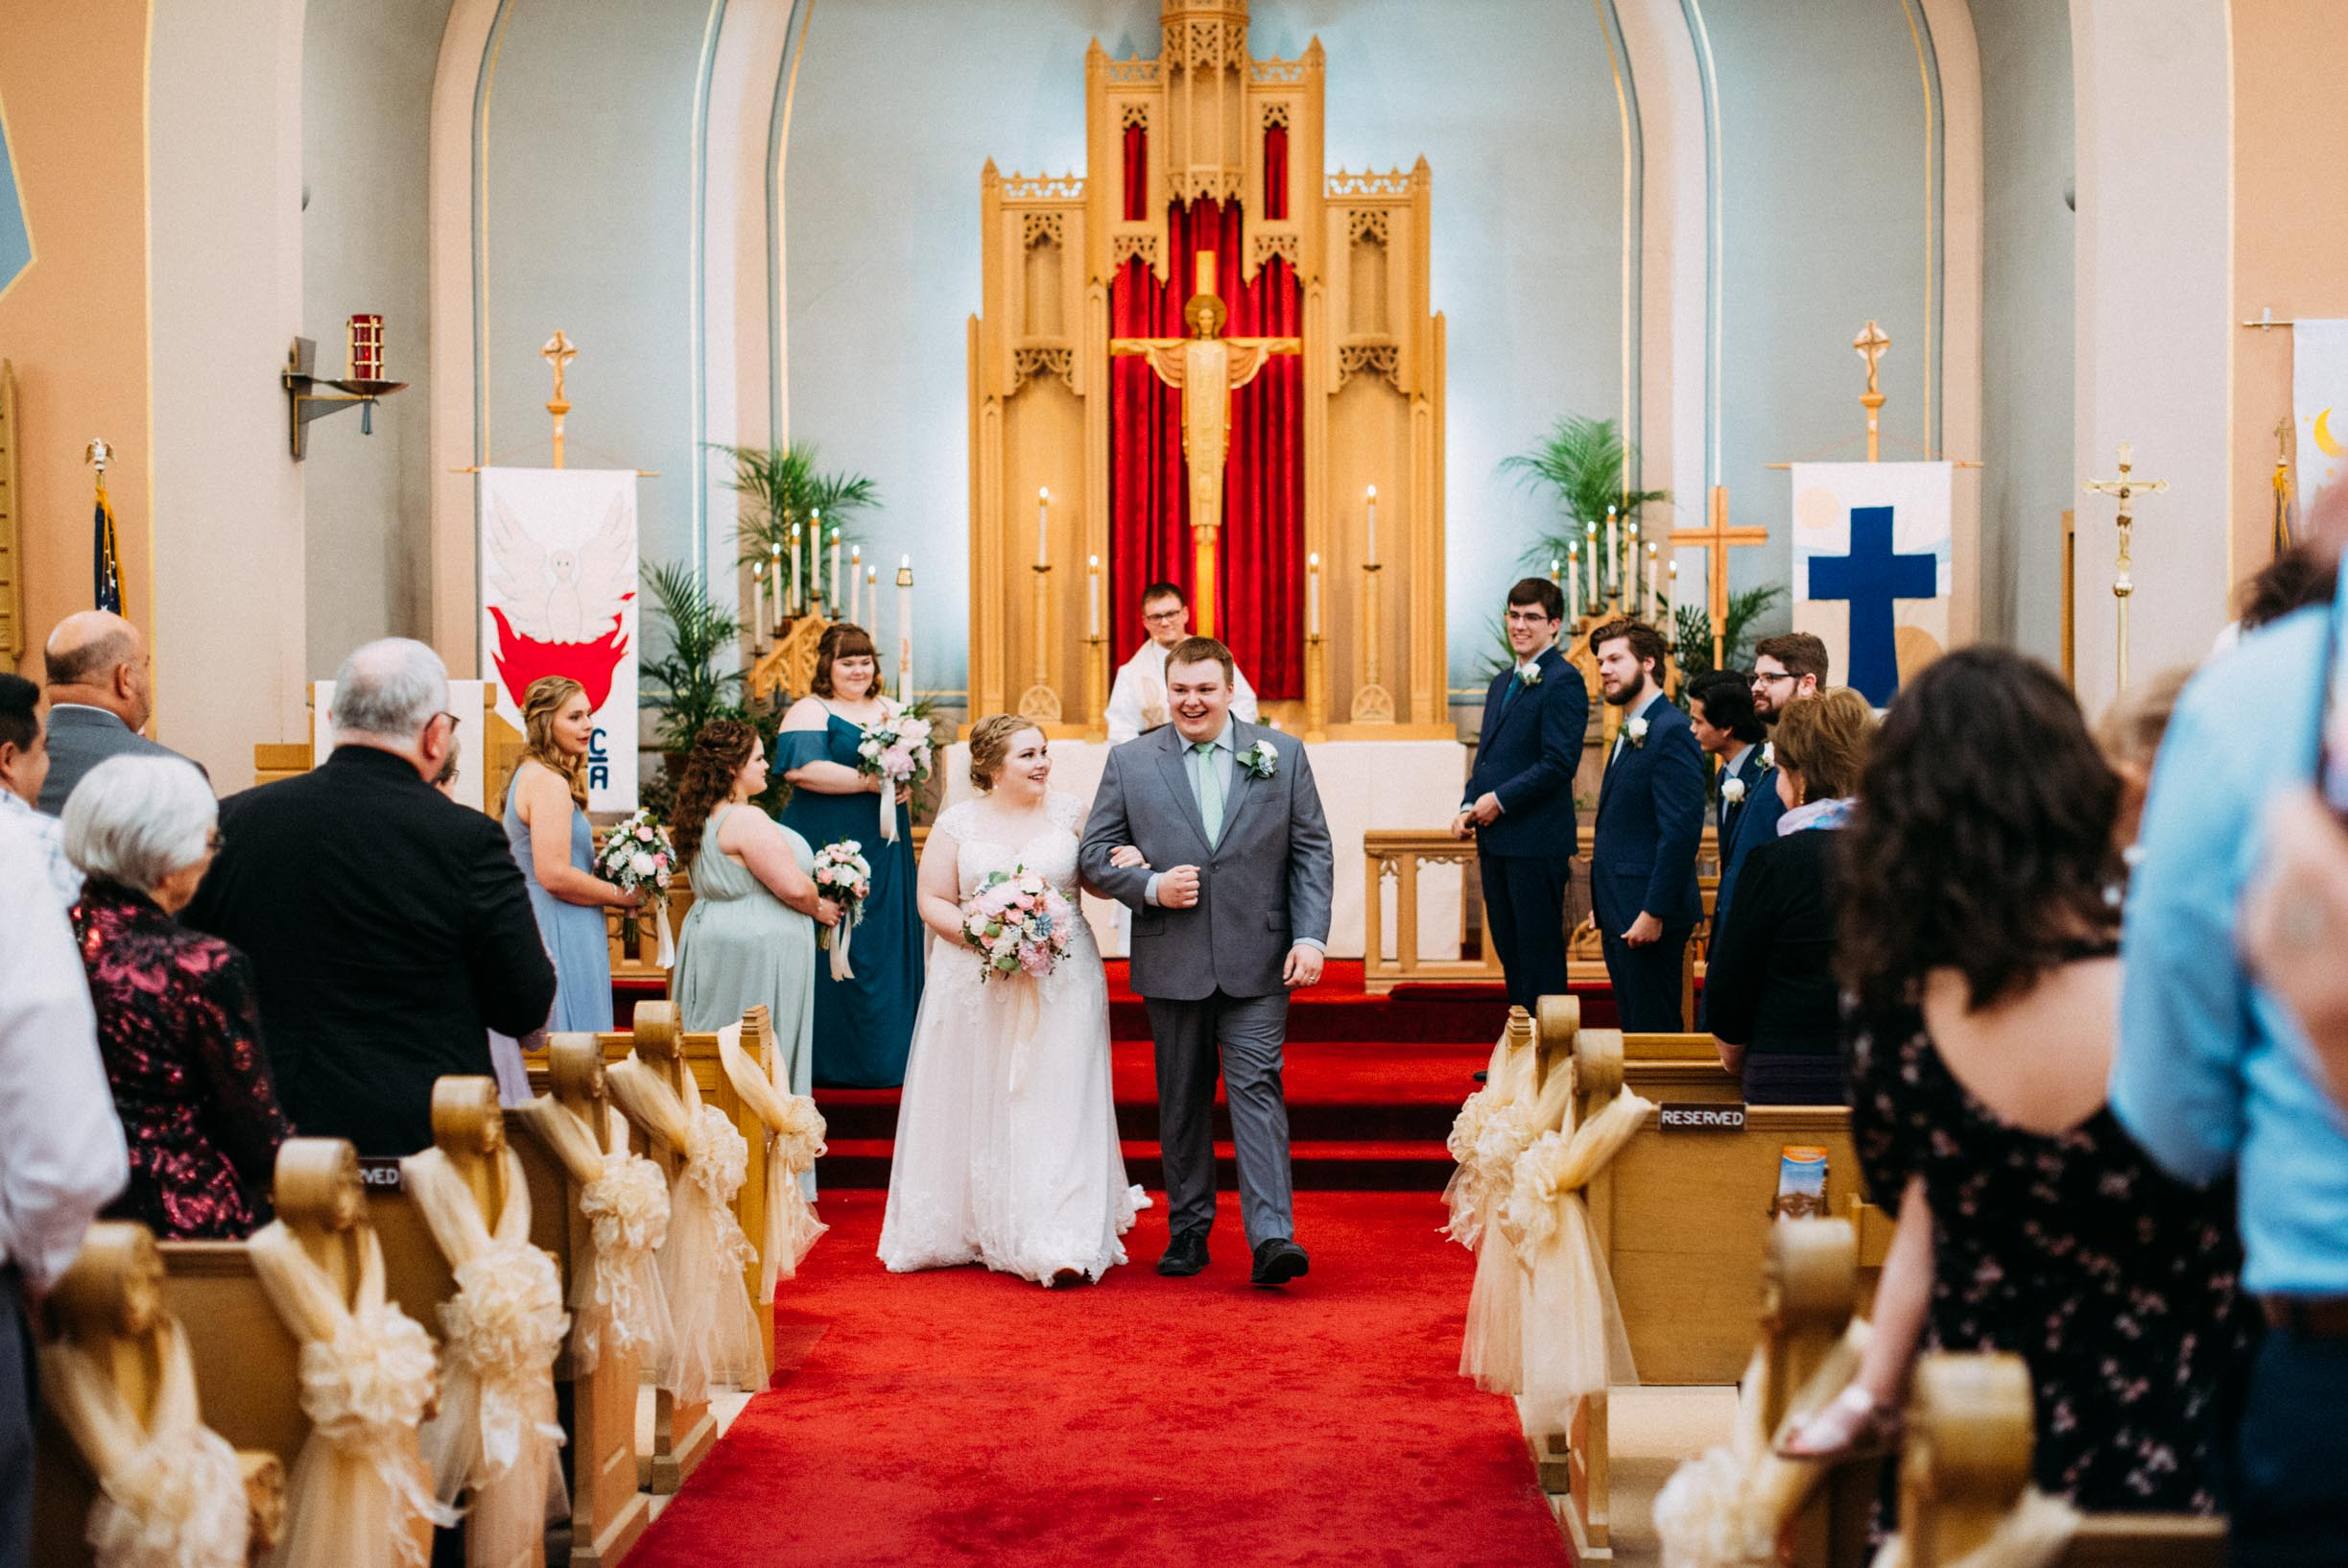 Hannah_Brandon_Wisconsin_Wedding_Ceremony-25.jpg